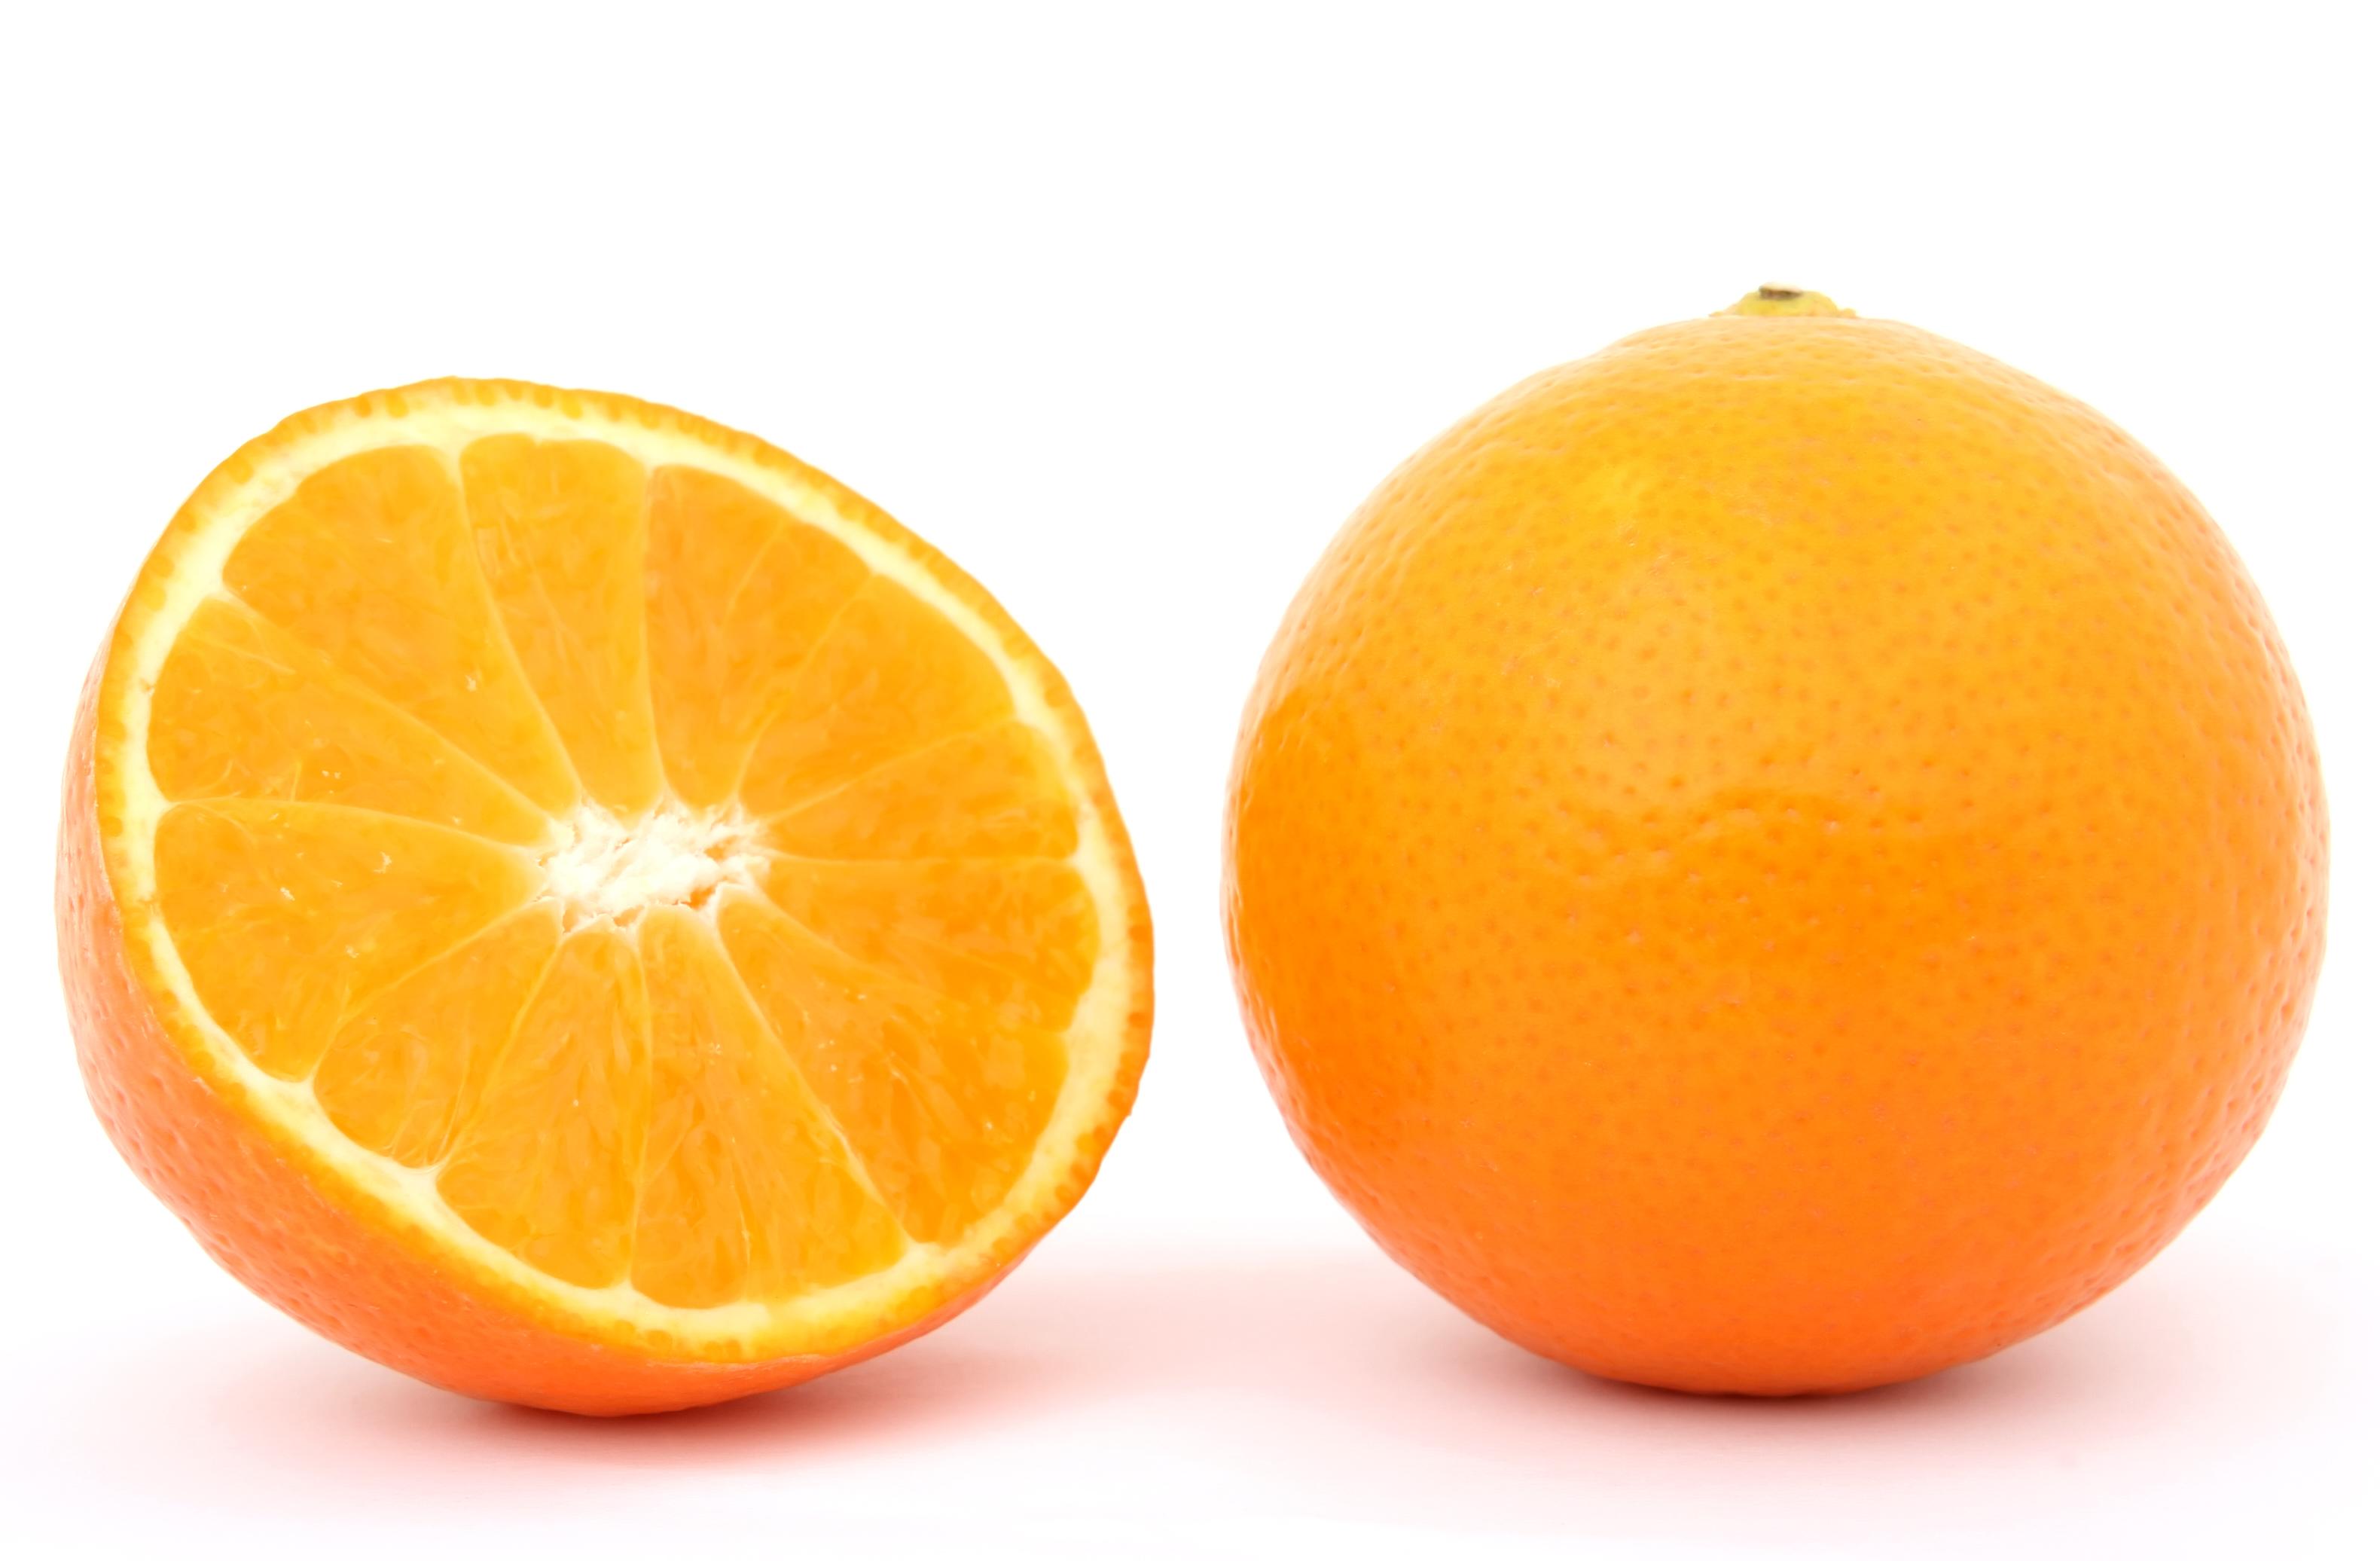 Or orange fruit hd wallpaper - Oranges Images Oranges Hd Wallpaper And Background Photos